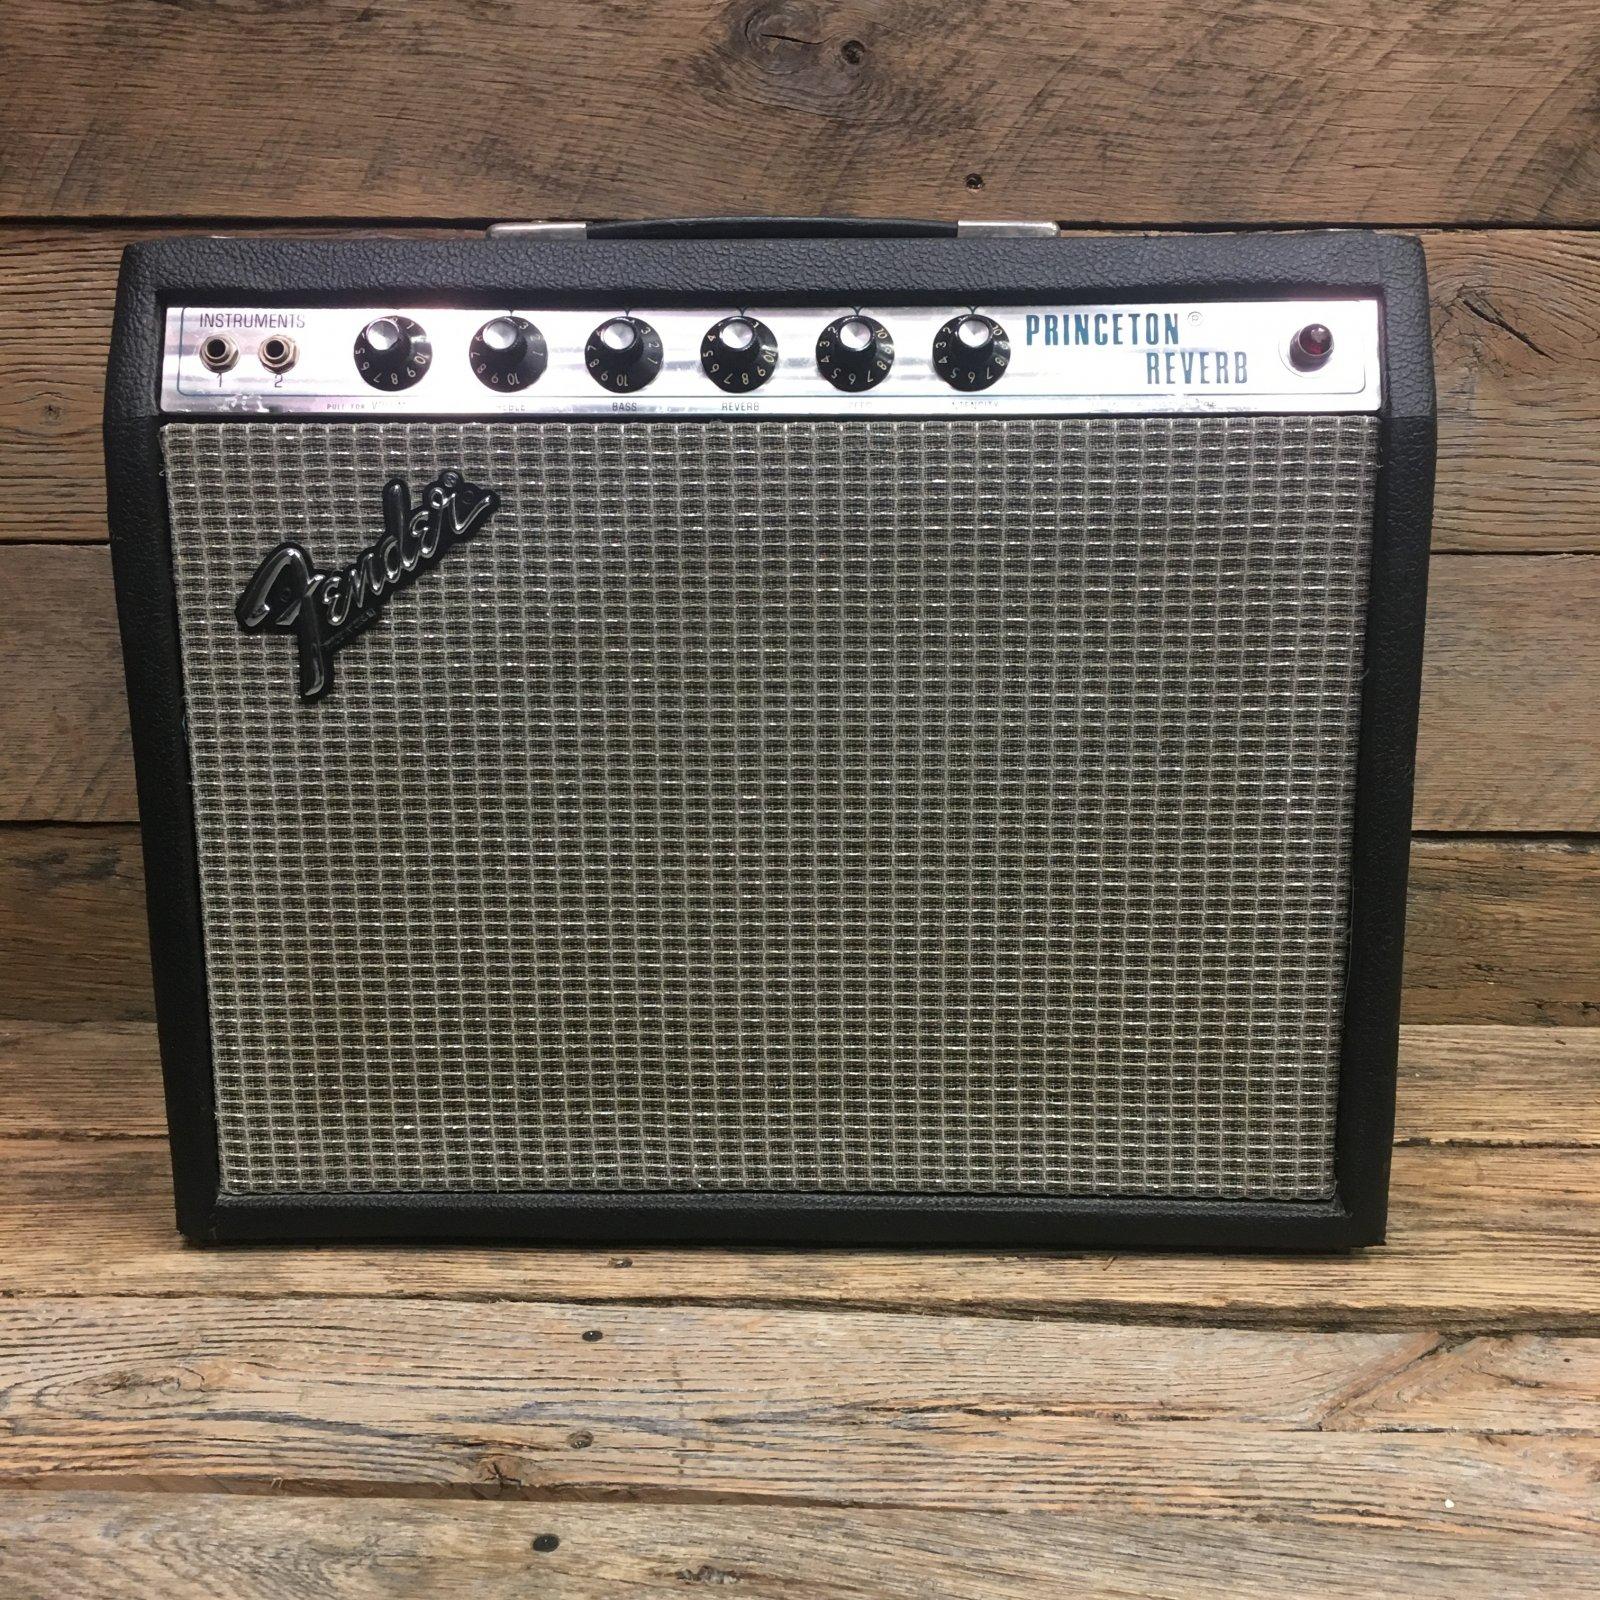 Used 1978 Fender Princeton Reverb